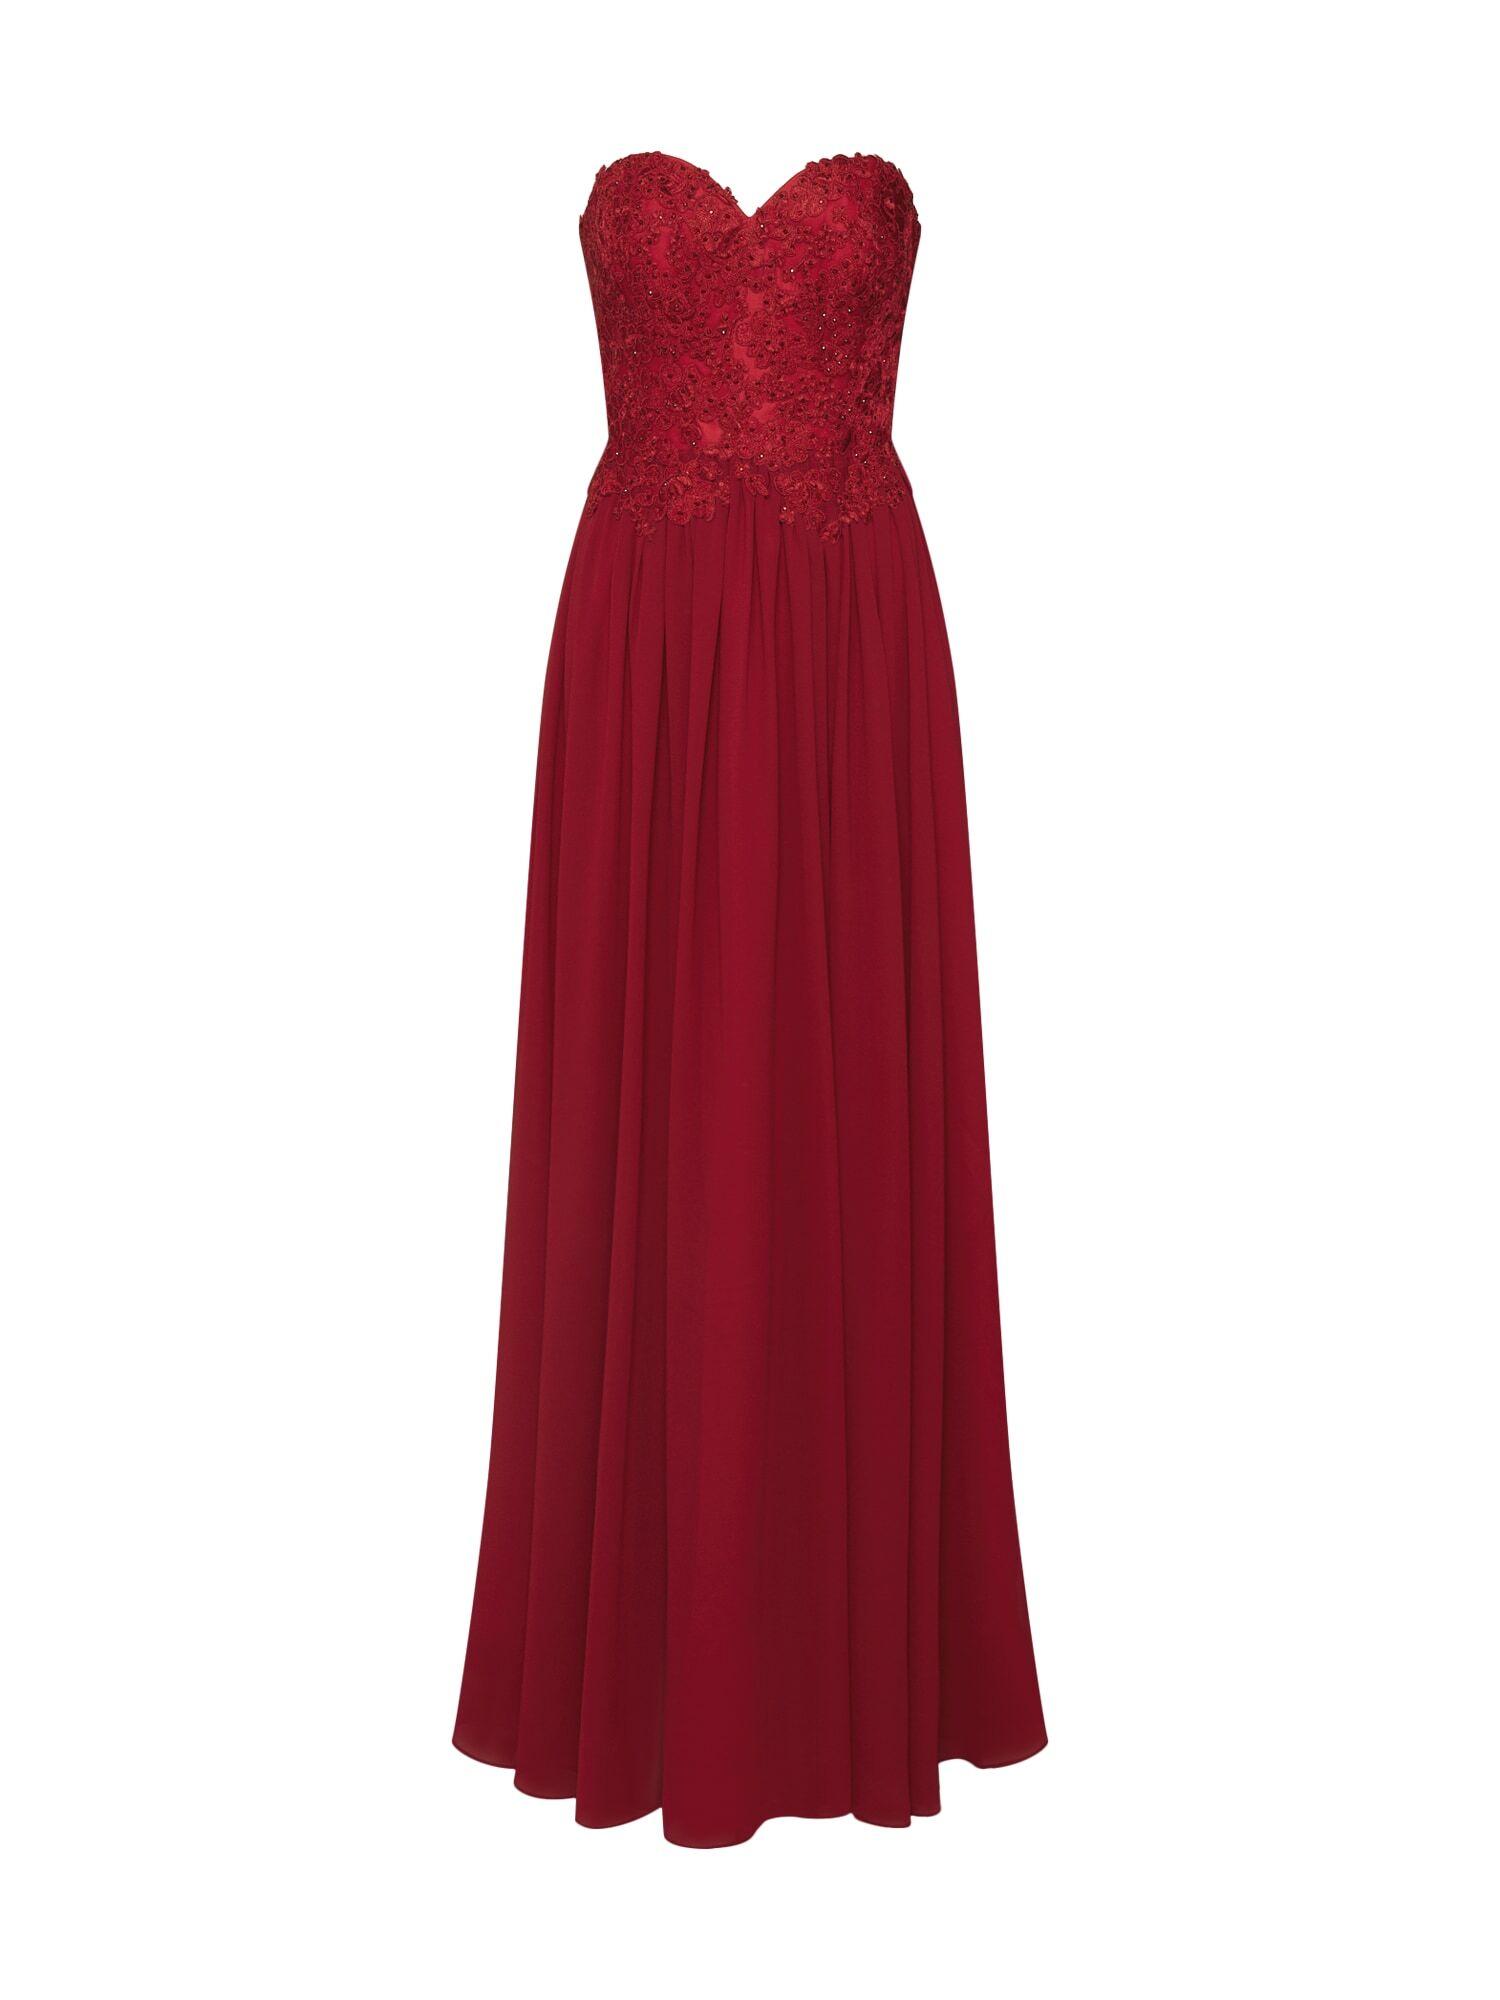 mascara Robe de soirée  - Rouge - Taille: 40 - female